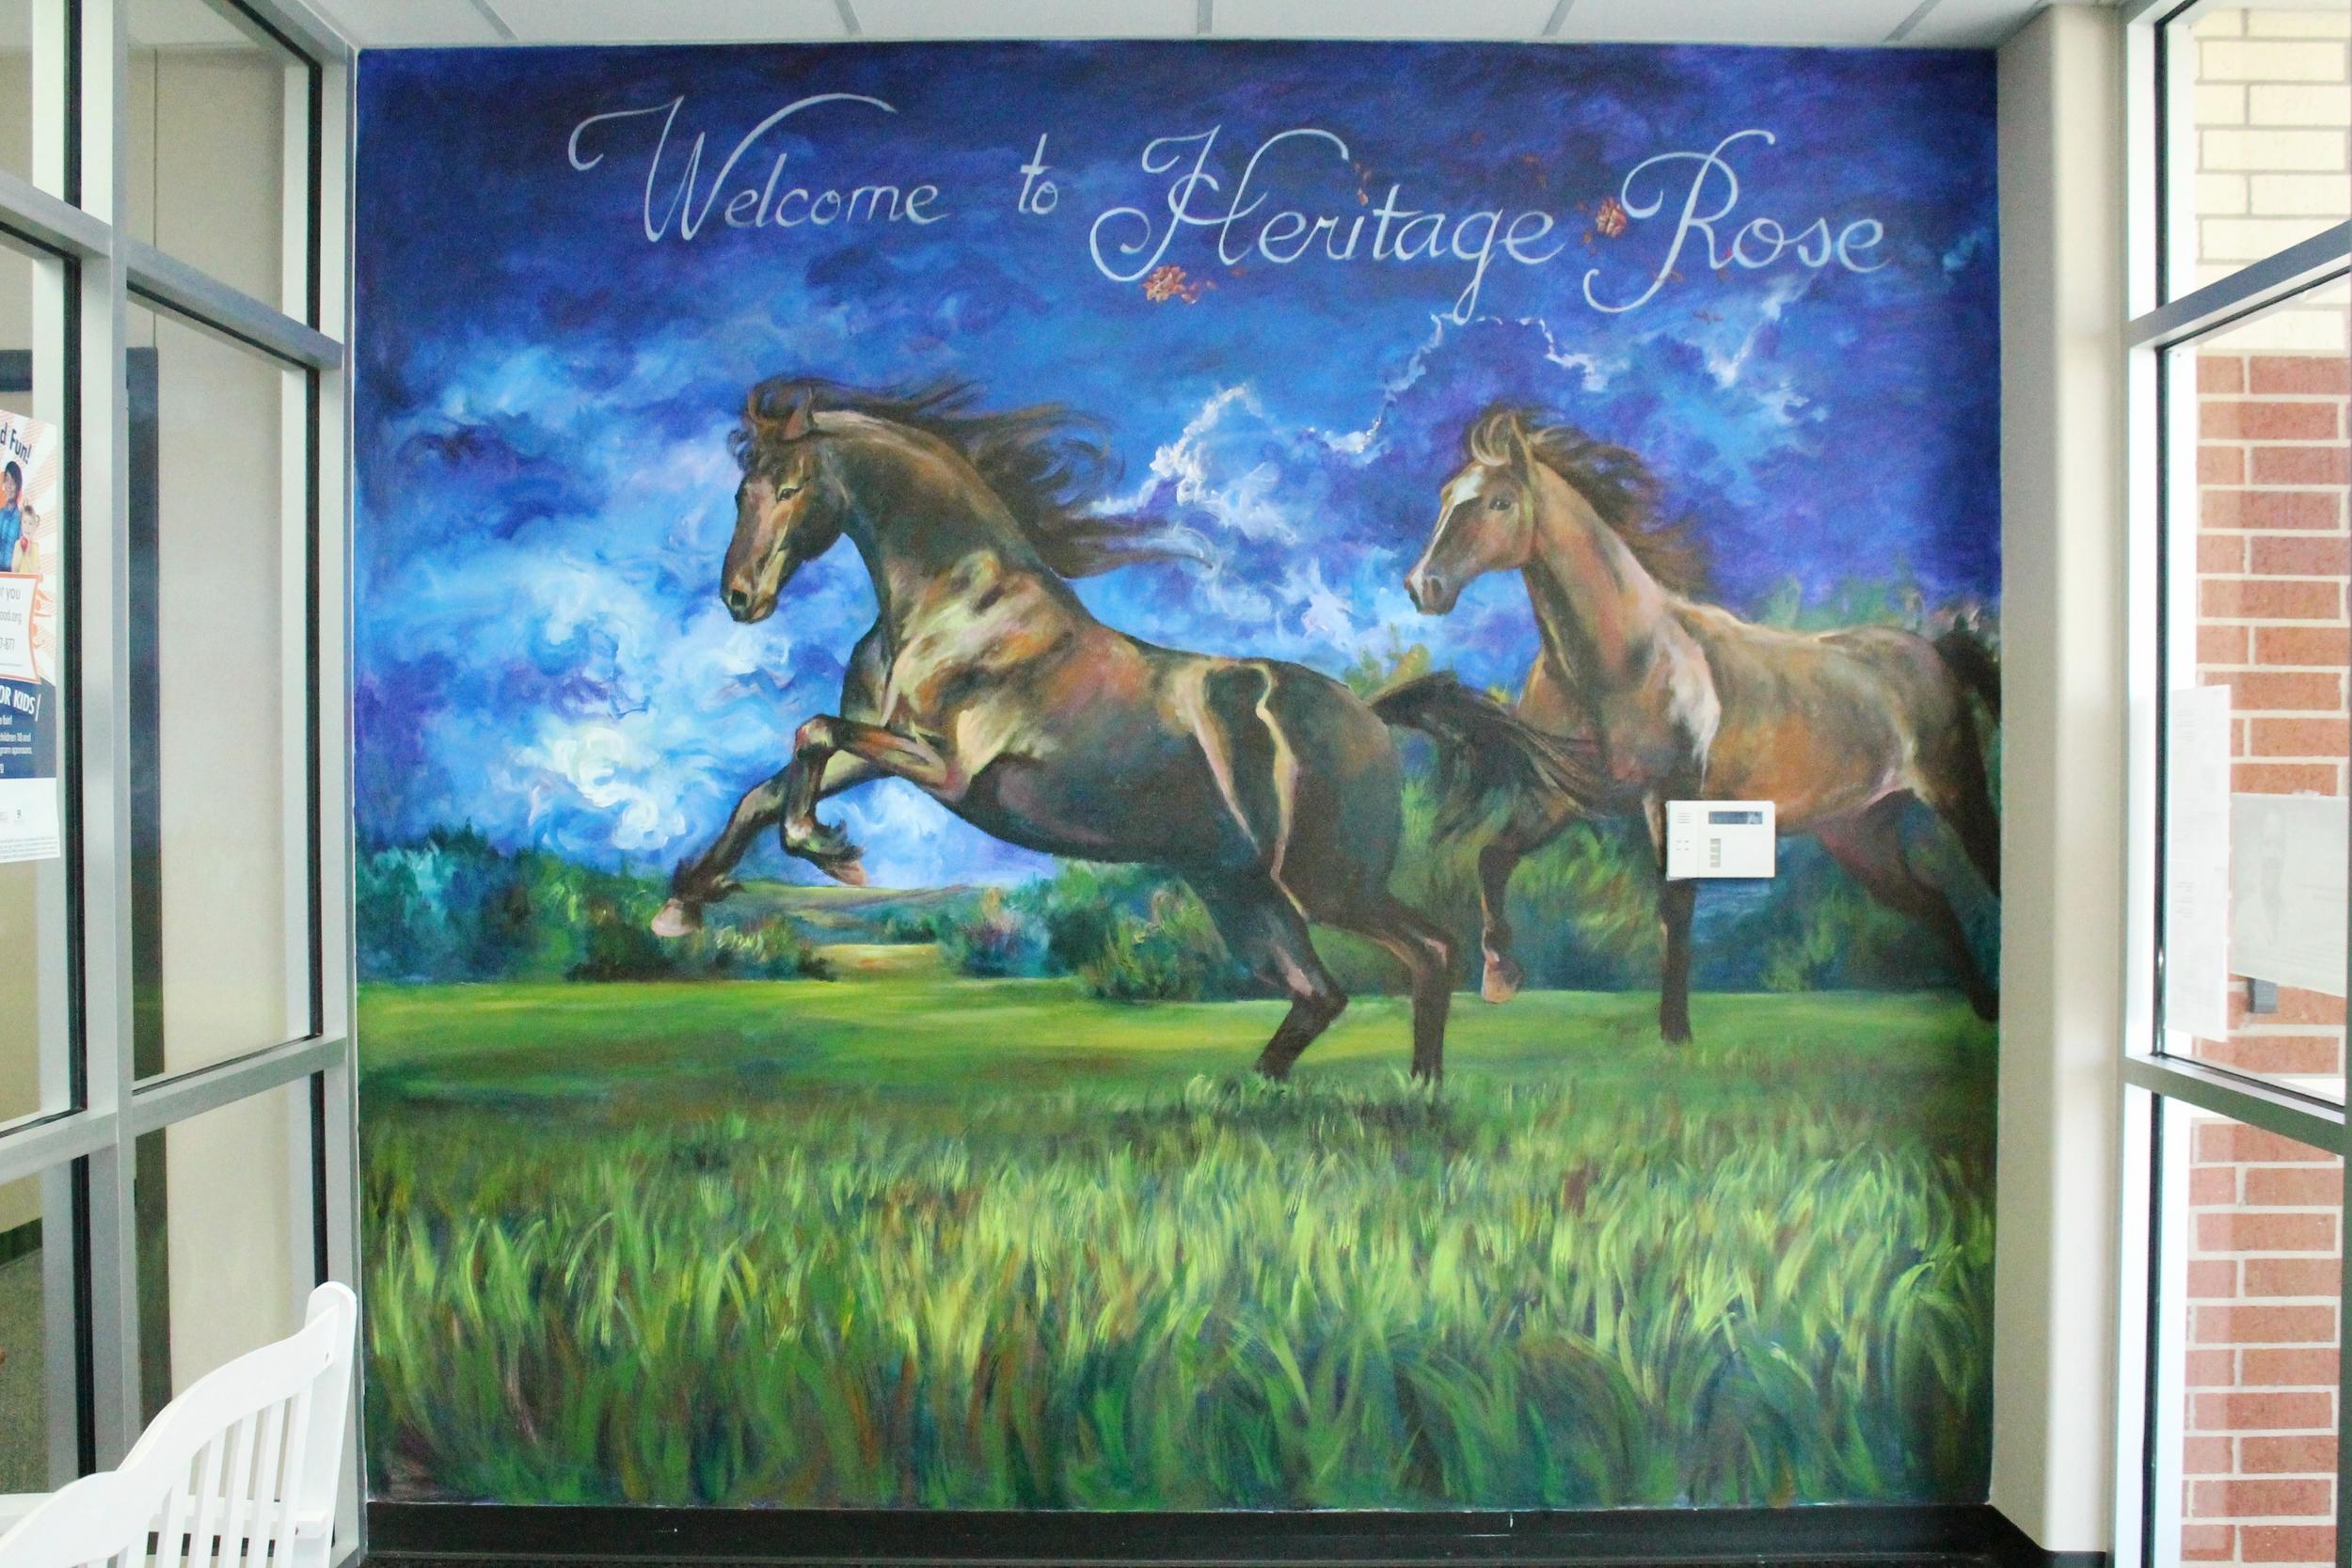 Heritage Rose Elementary 2013